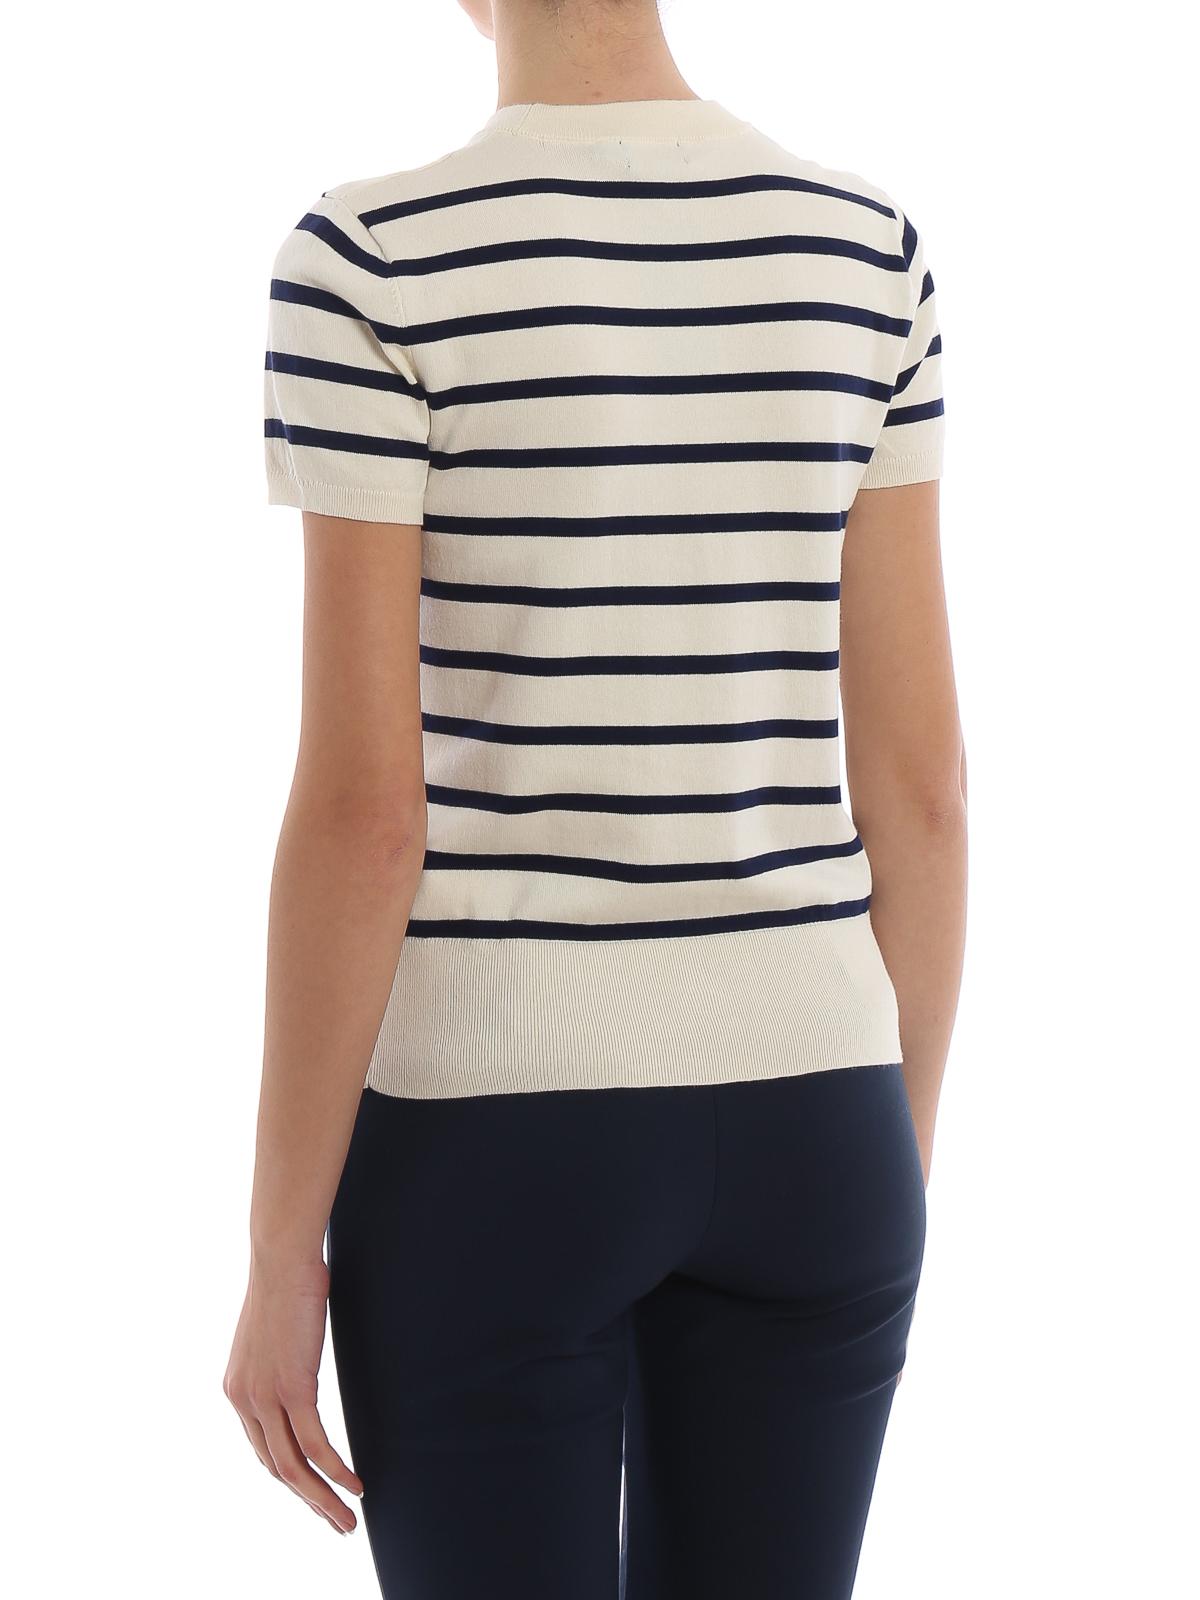 eb1988f7 Polo Ralph Lauren - Cotton blend striped crew neck - crew necks ...